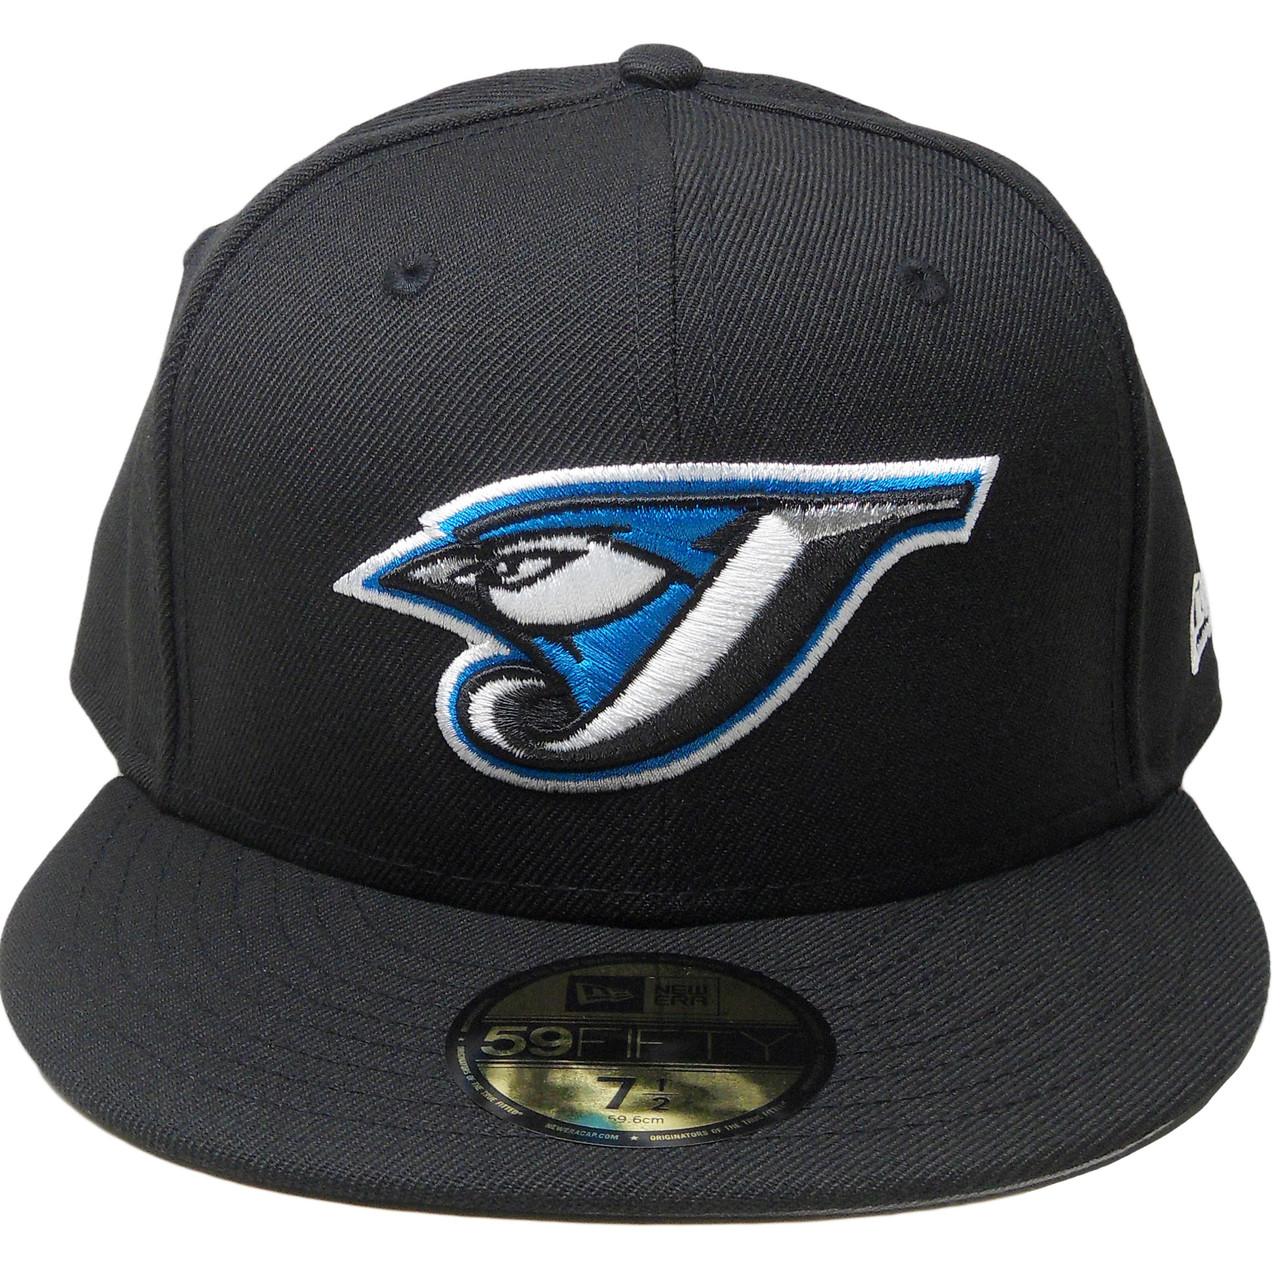 3d365f0bbf5 Toronto Blue Jays Custom New Era Gray Bottom Fitted - Black